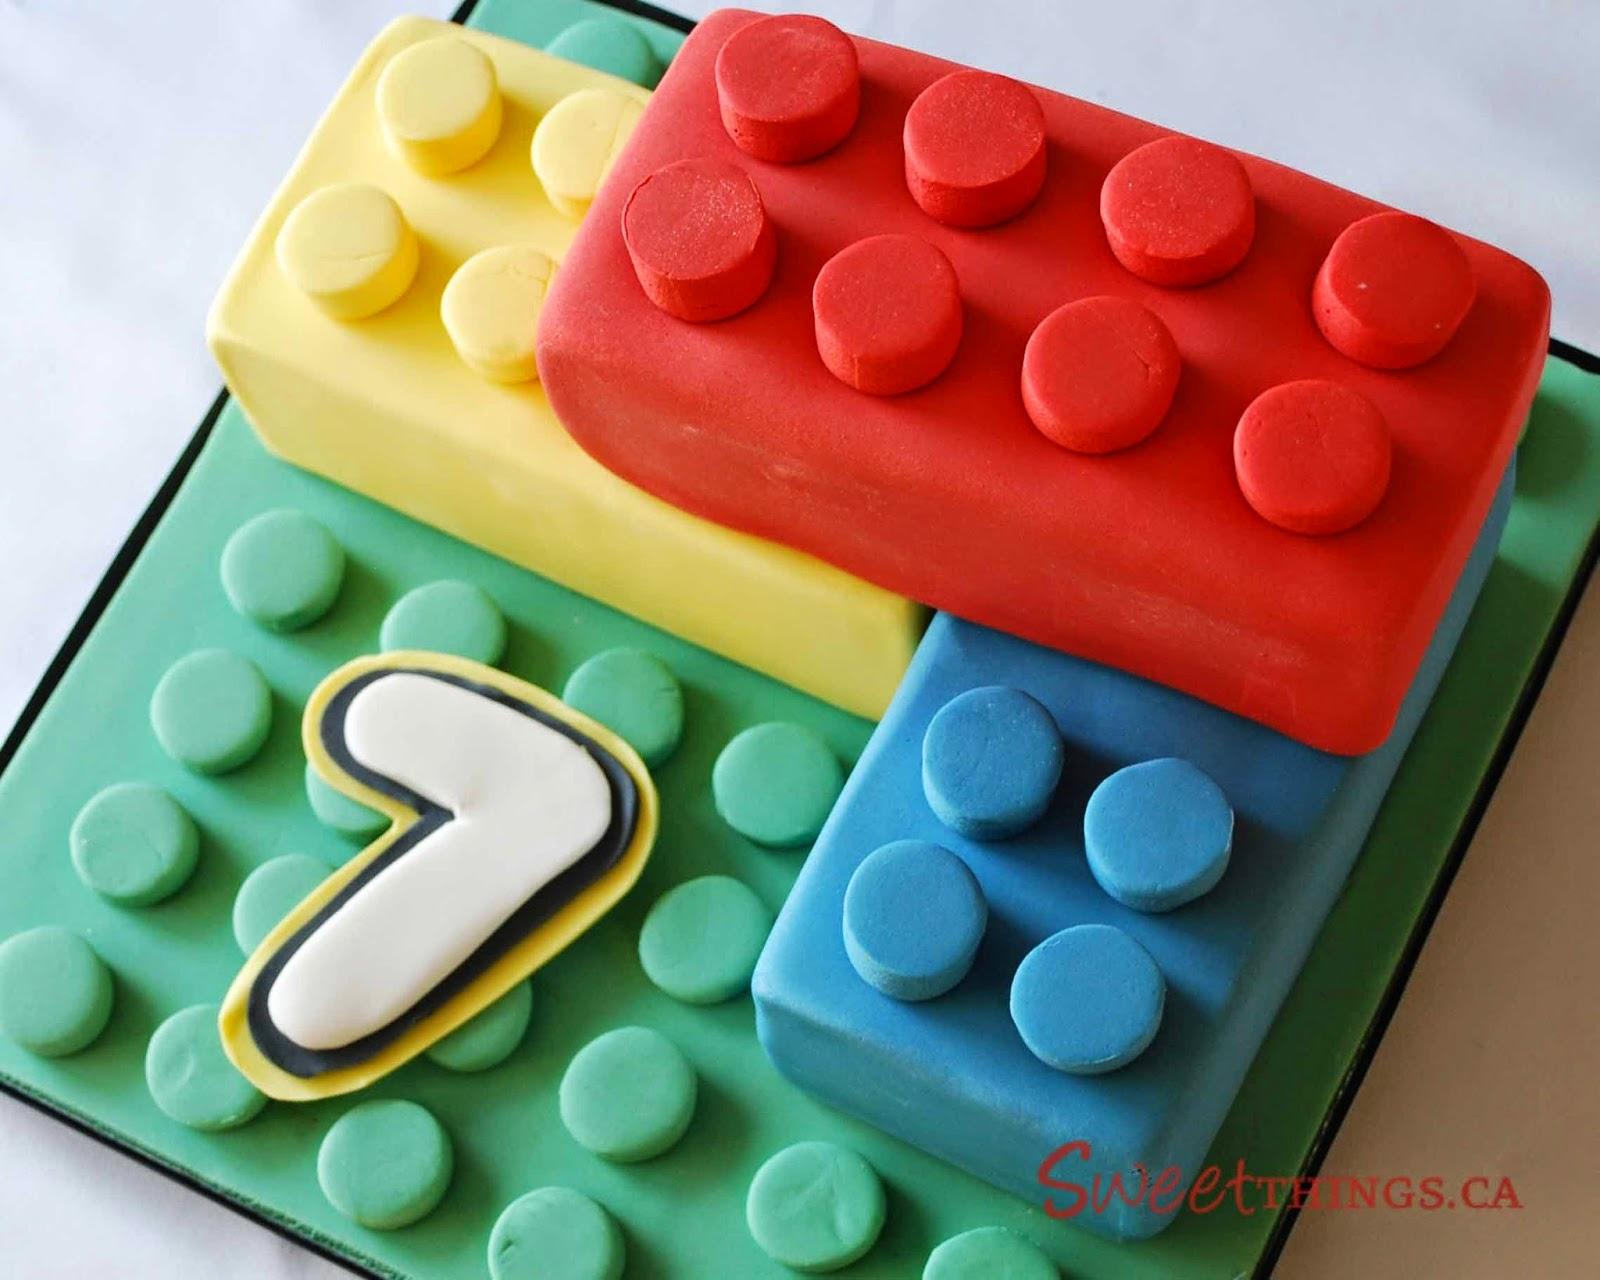 Cake Designs For 7th Birthday Boy : SweetThings: 7th Birthday: Lego Cake